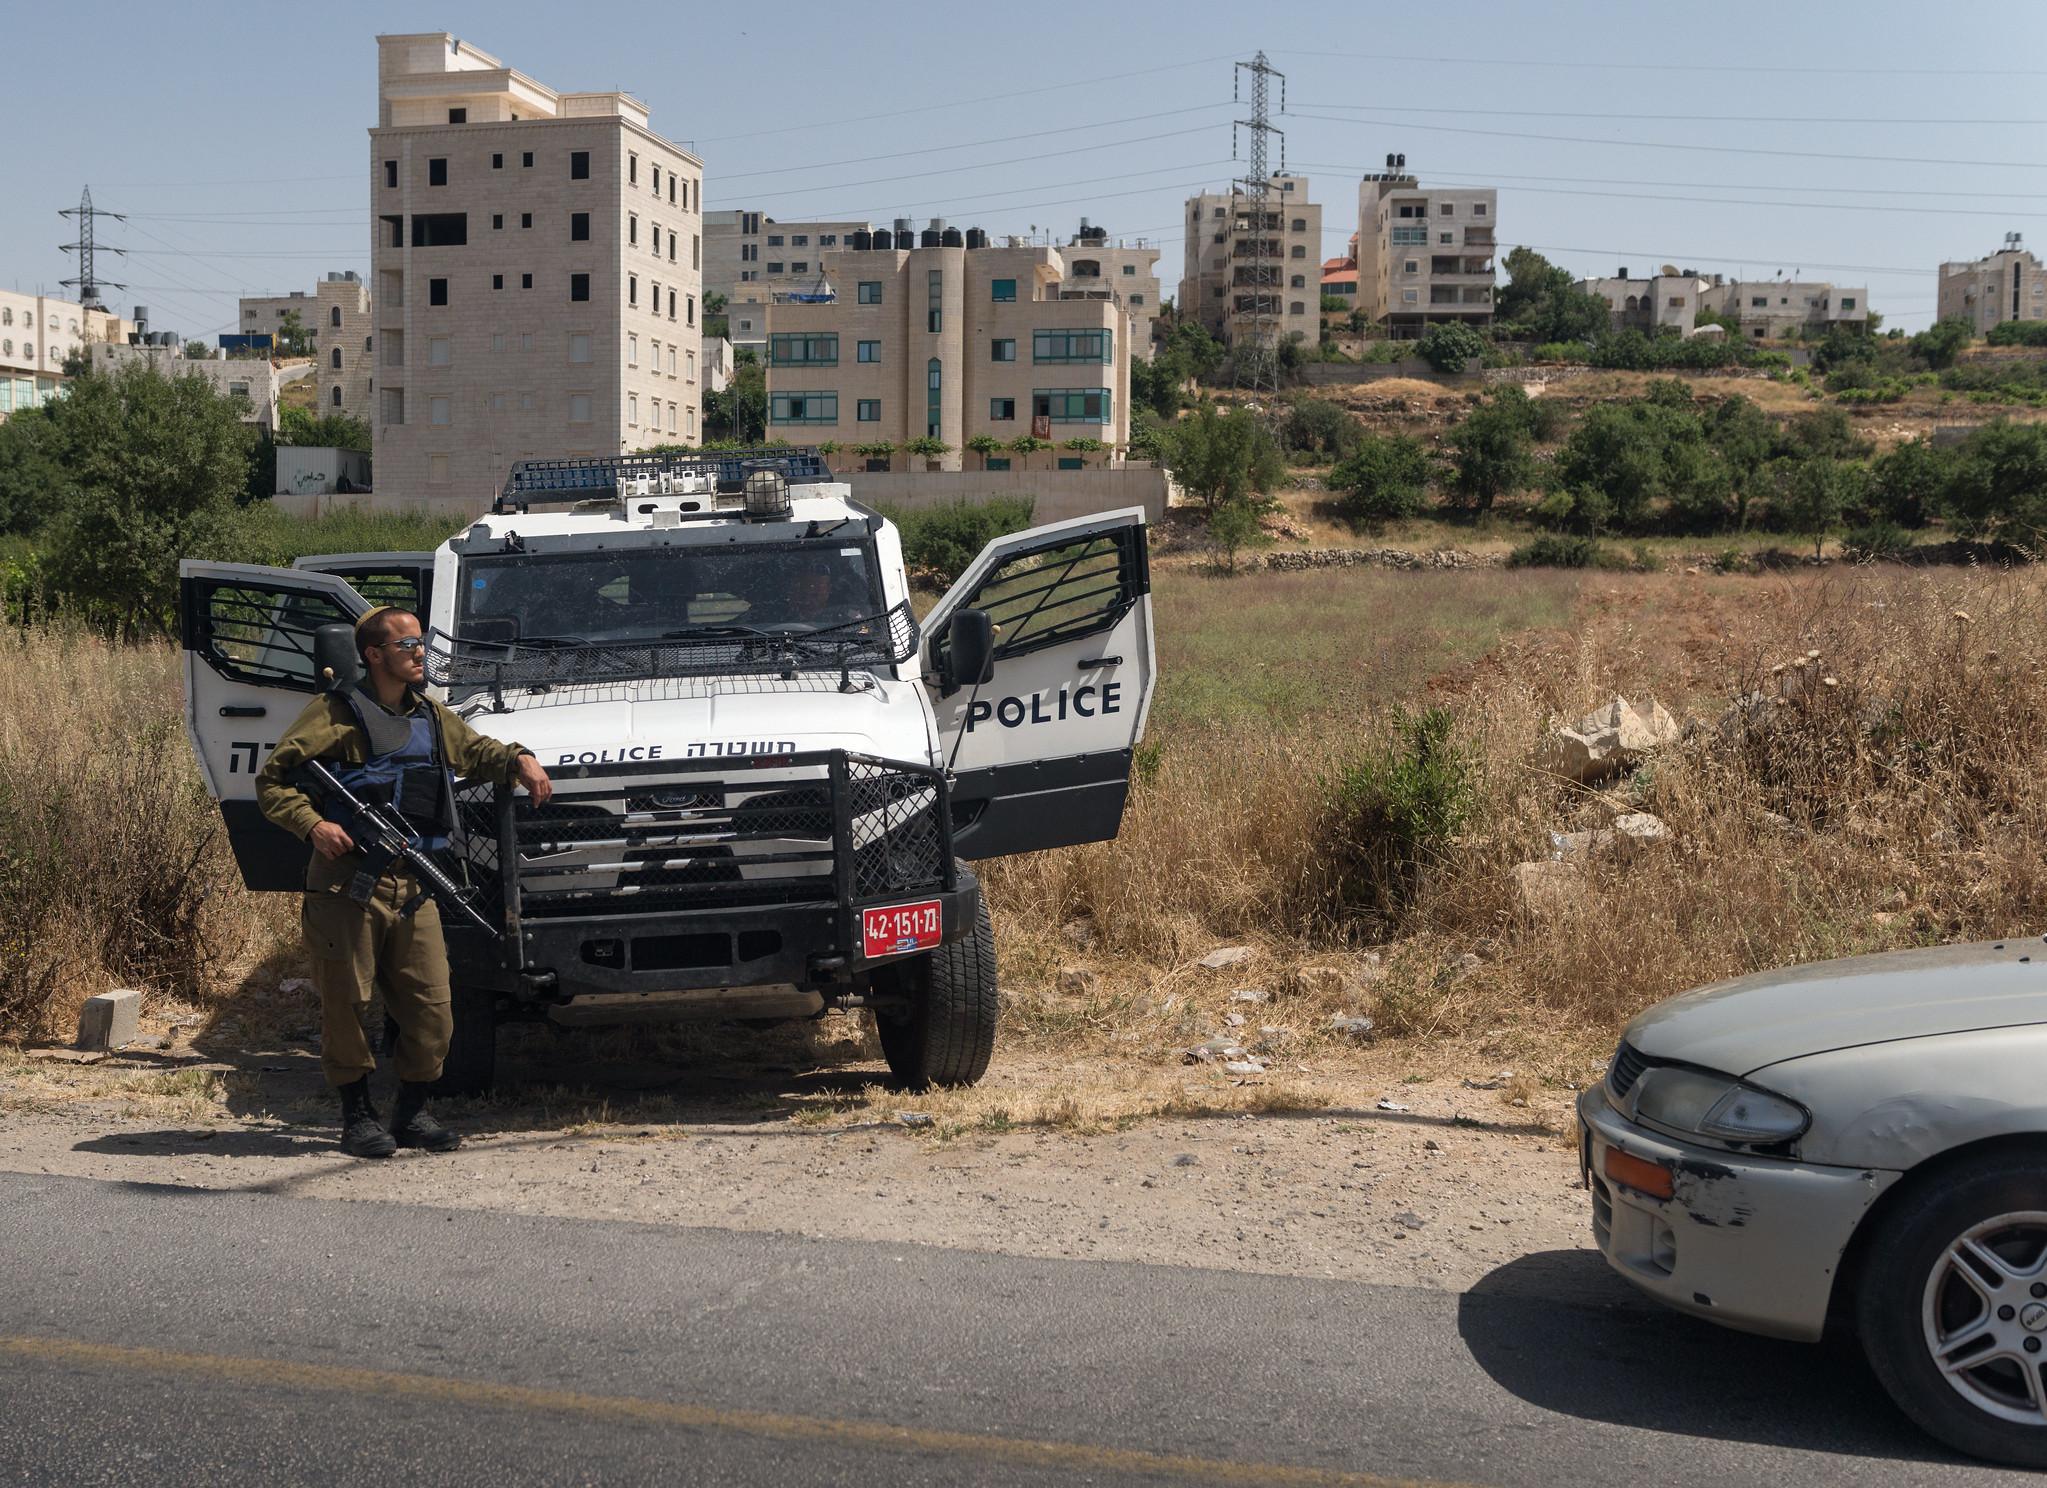 West Bank Roadside Police